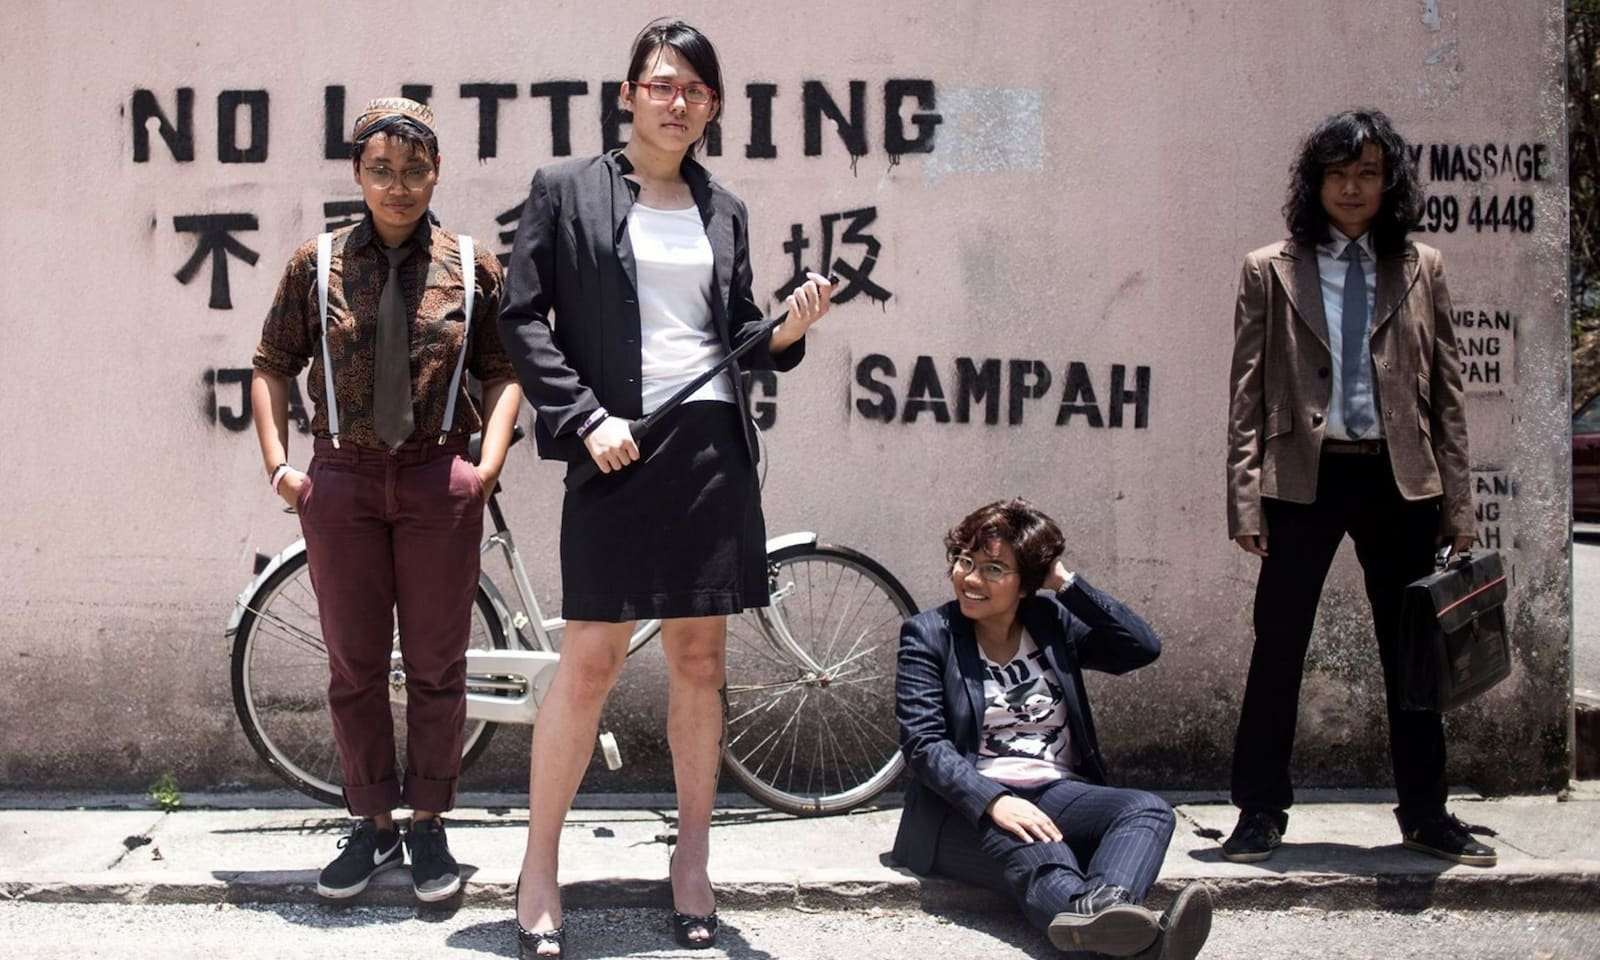 Shh… Diam!: When Punk Rock Meets Queers